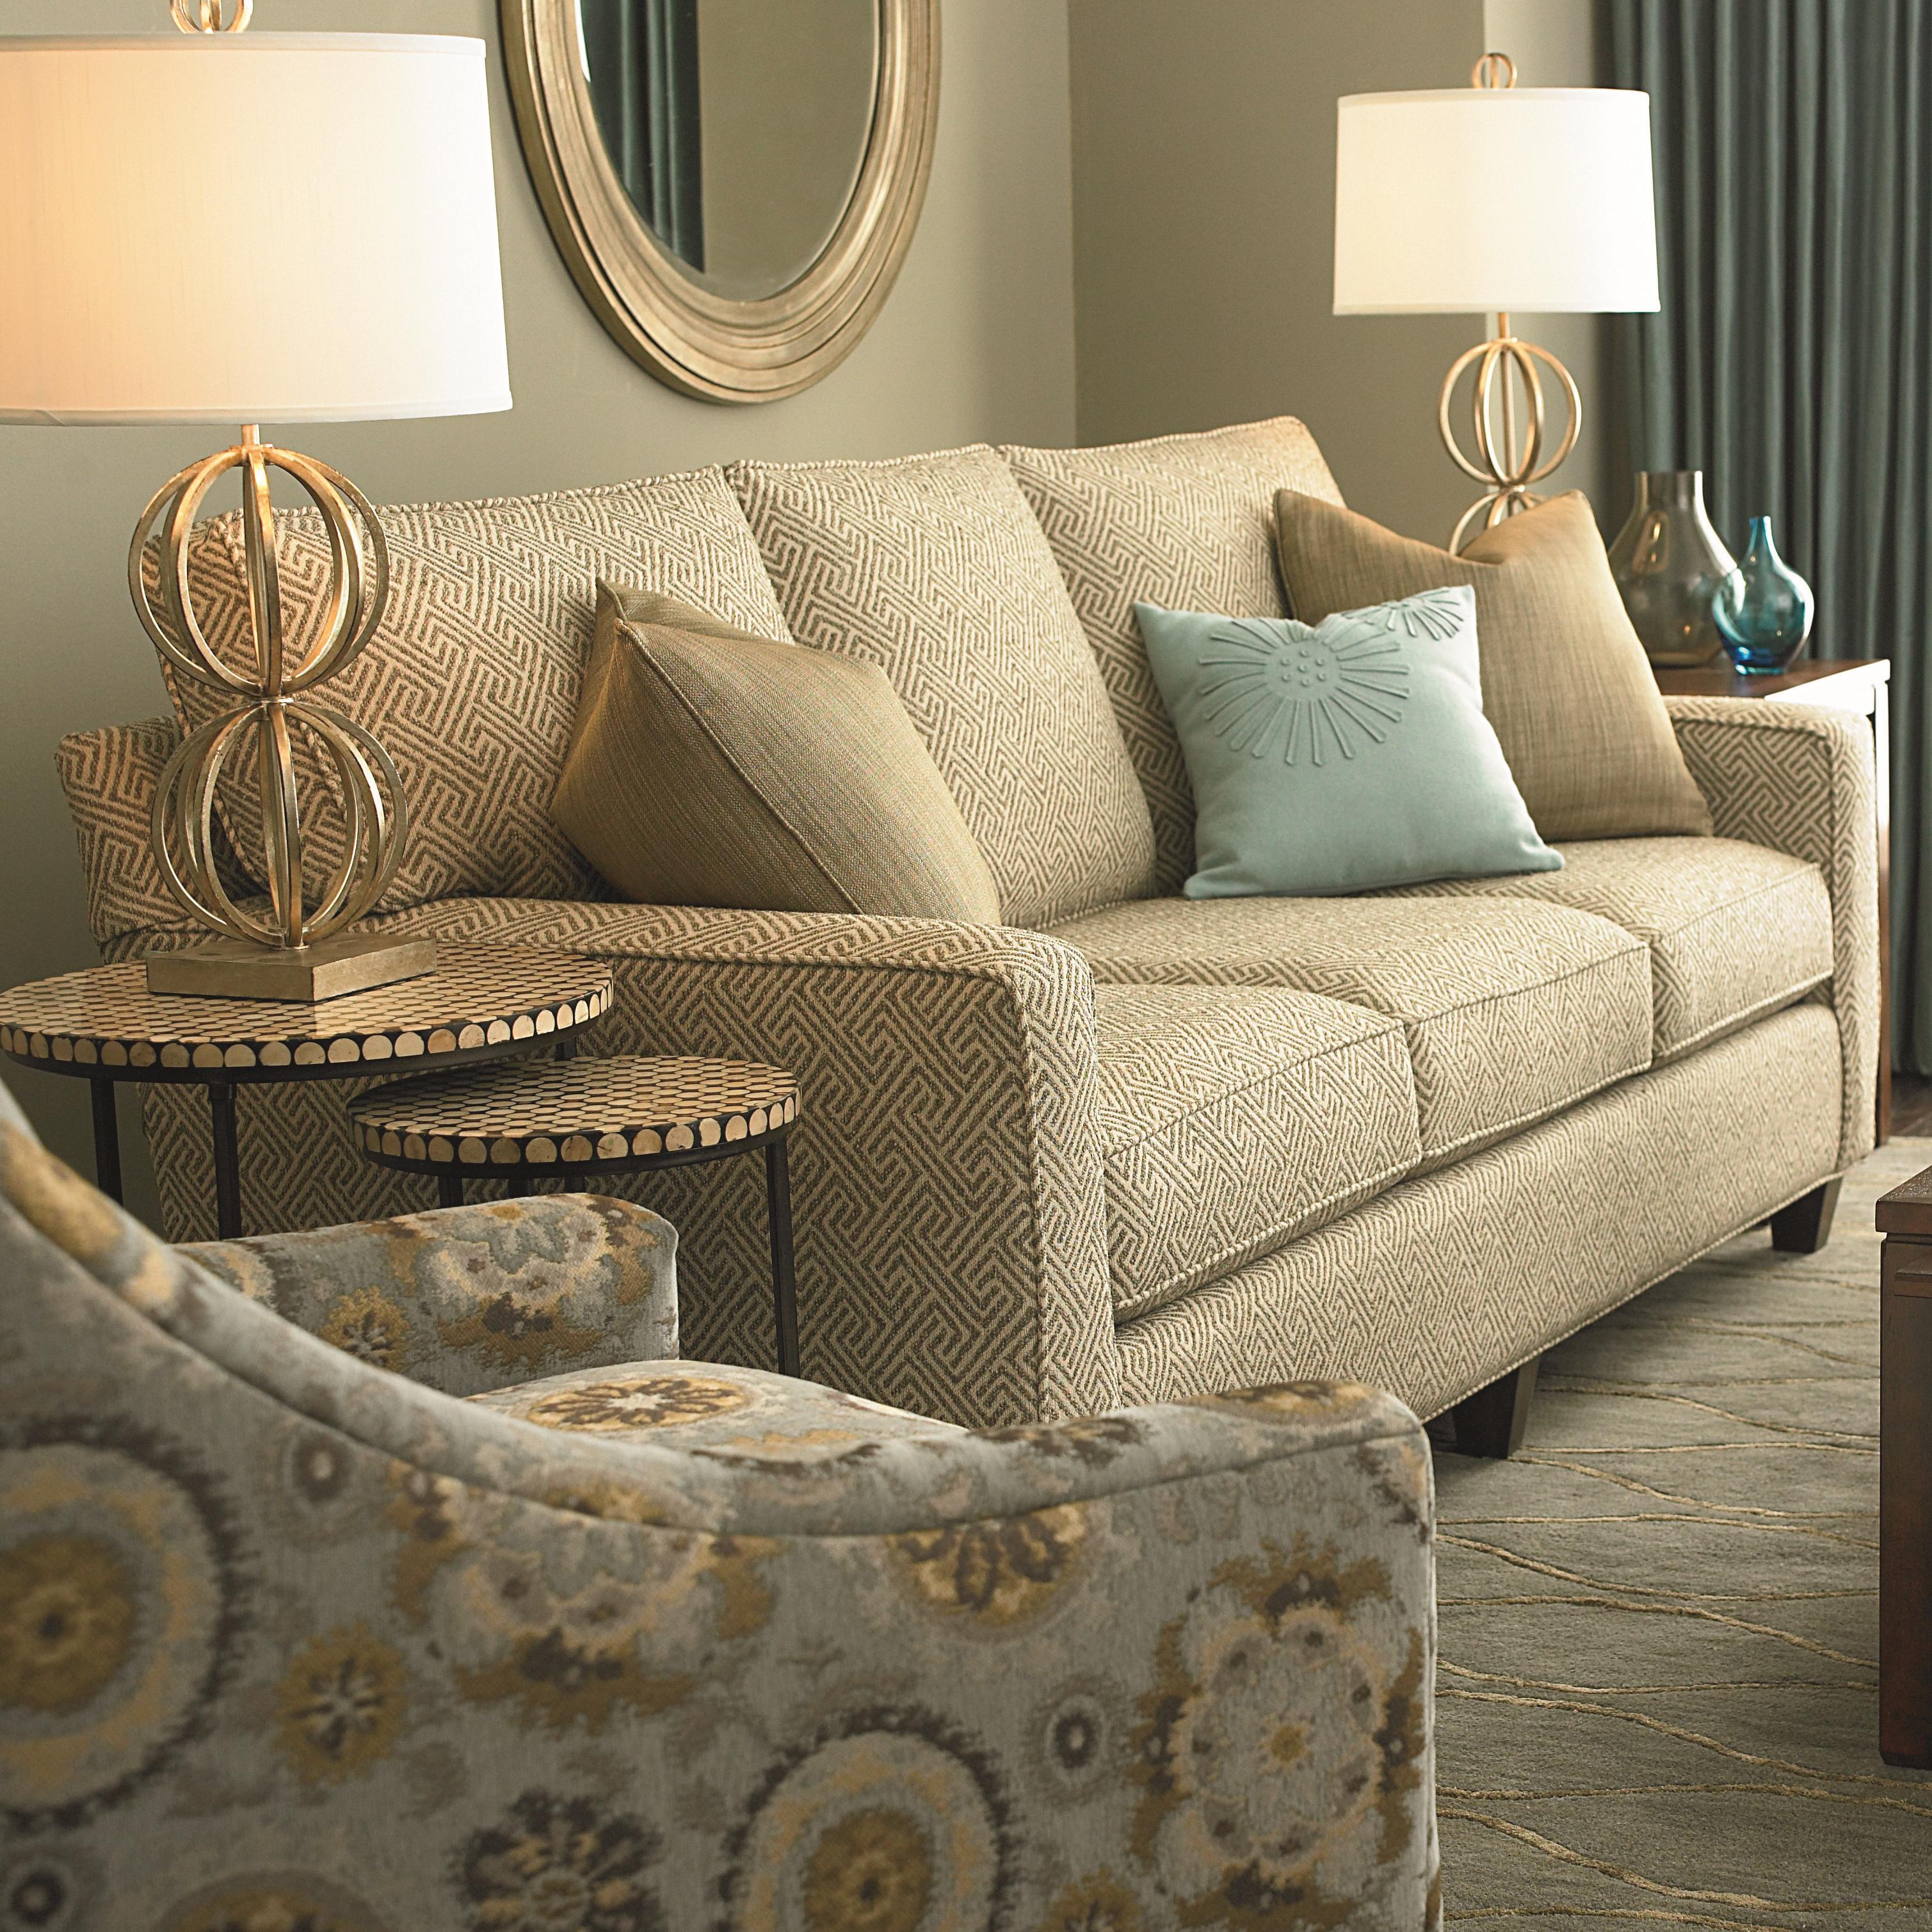 Bassett Custom Upholstery   Medium Scale U003cbu003eCustomizableu003c/bu003e Queen Sleeper